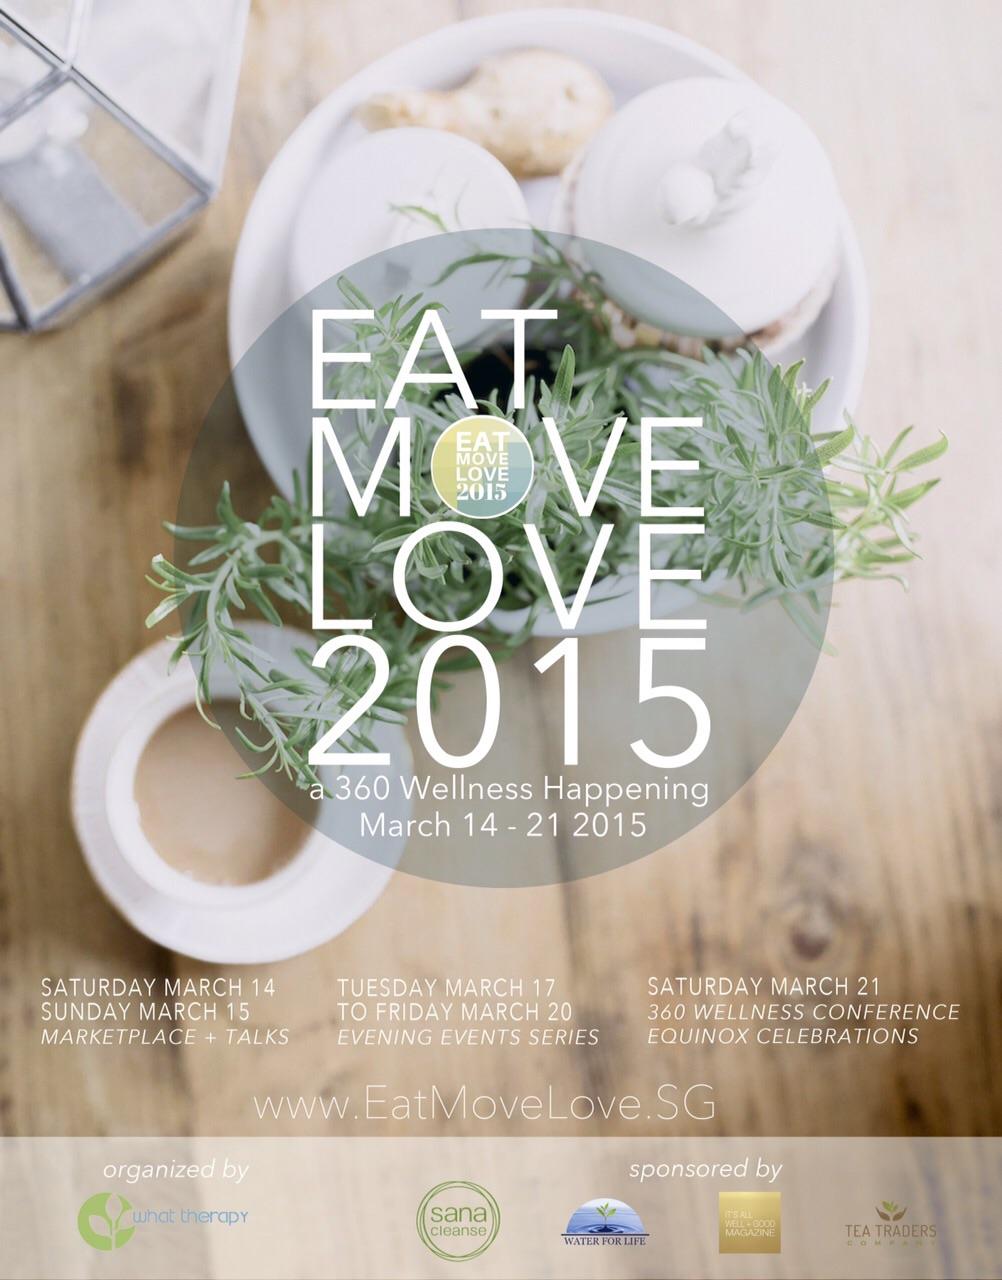 EAT MOVE LOVE 2015